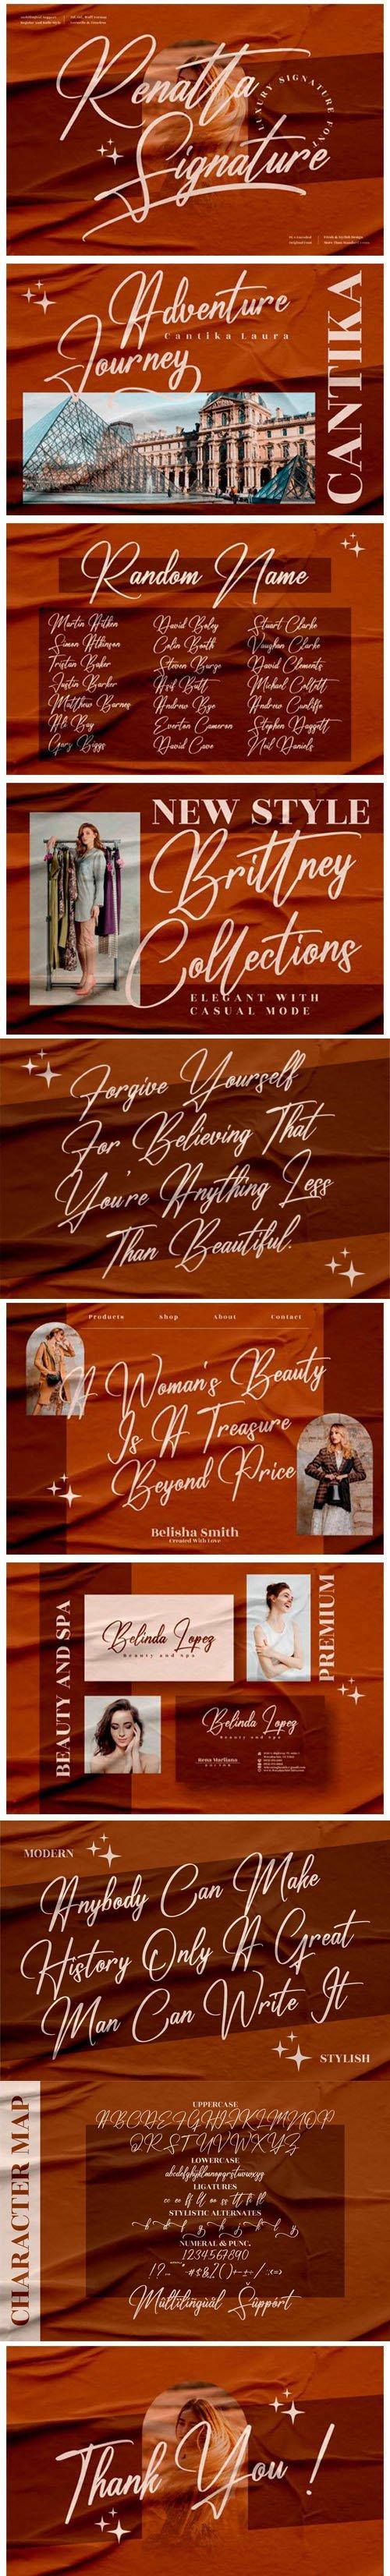 Renatta Signature - Luxury Signature Font [2-Weights]